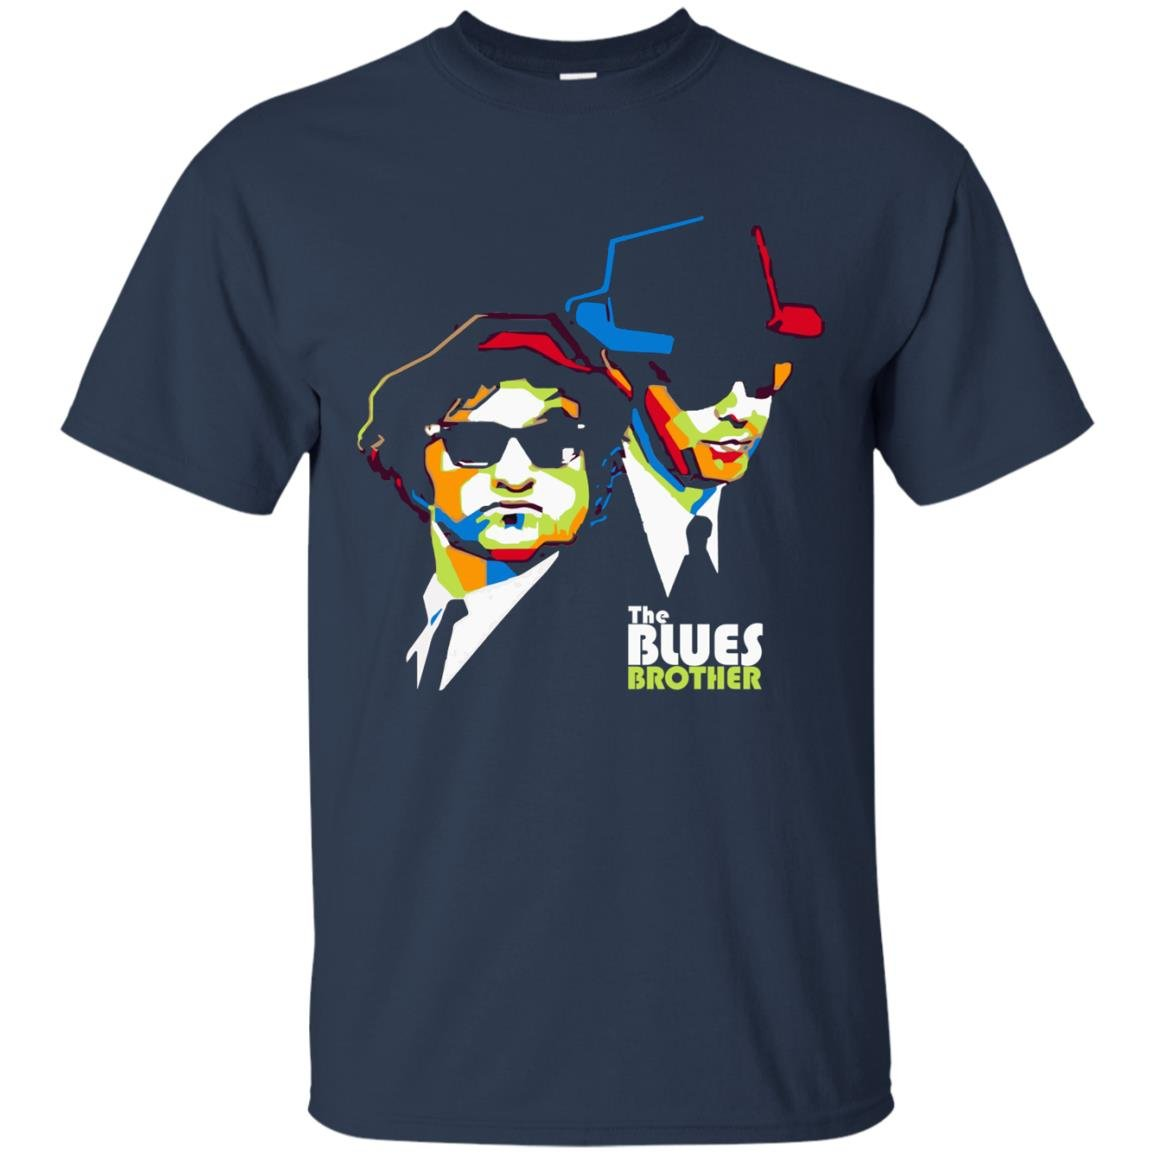 image 640 - The Blues Brother Shirt, Sweatshirt, Hoodie